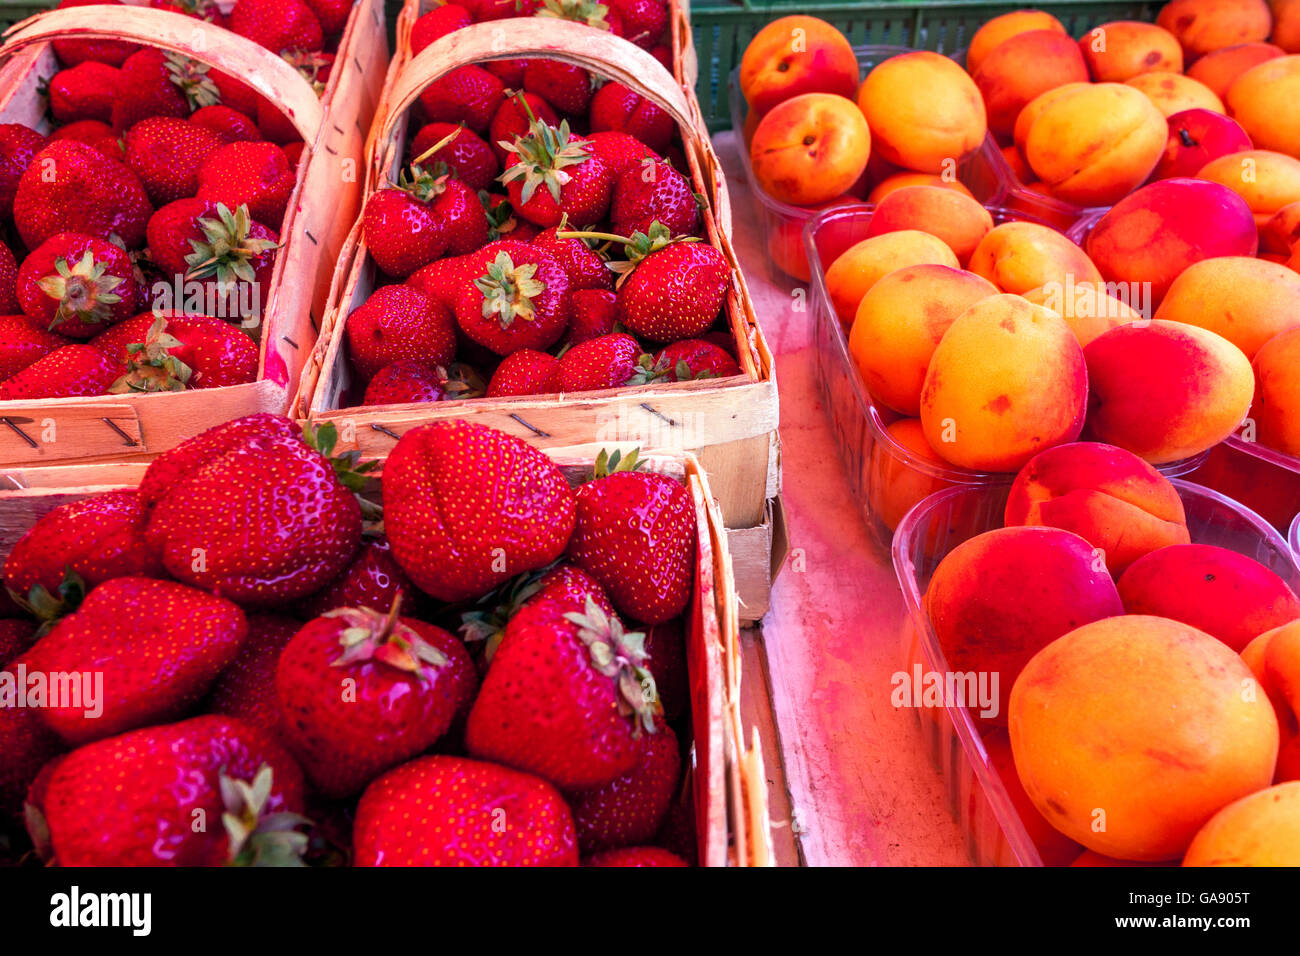 strawberry, apricot - Stock Image